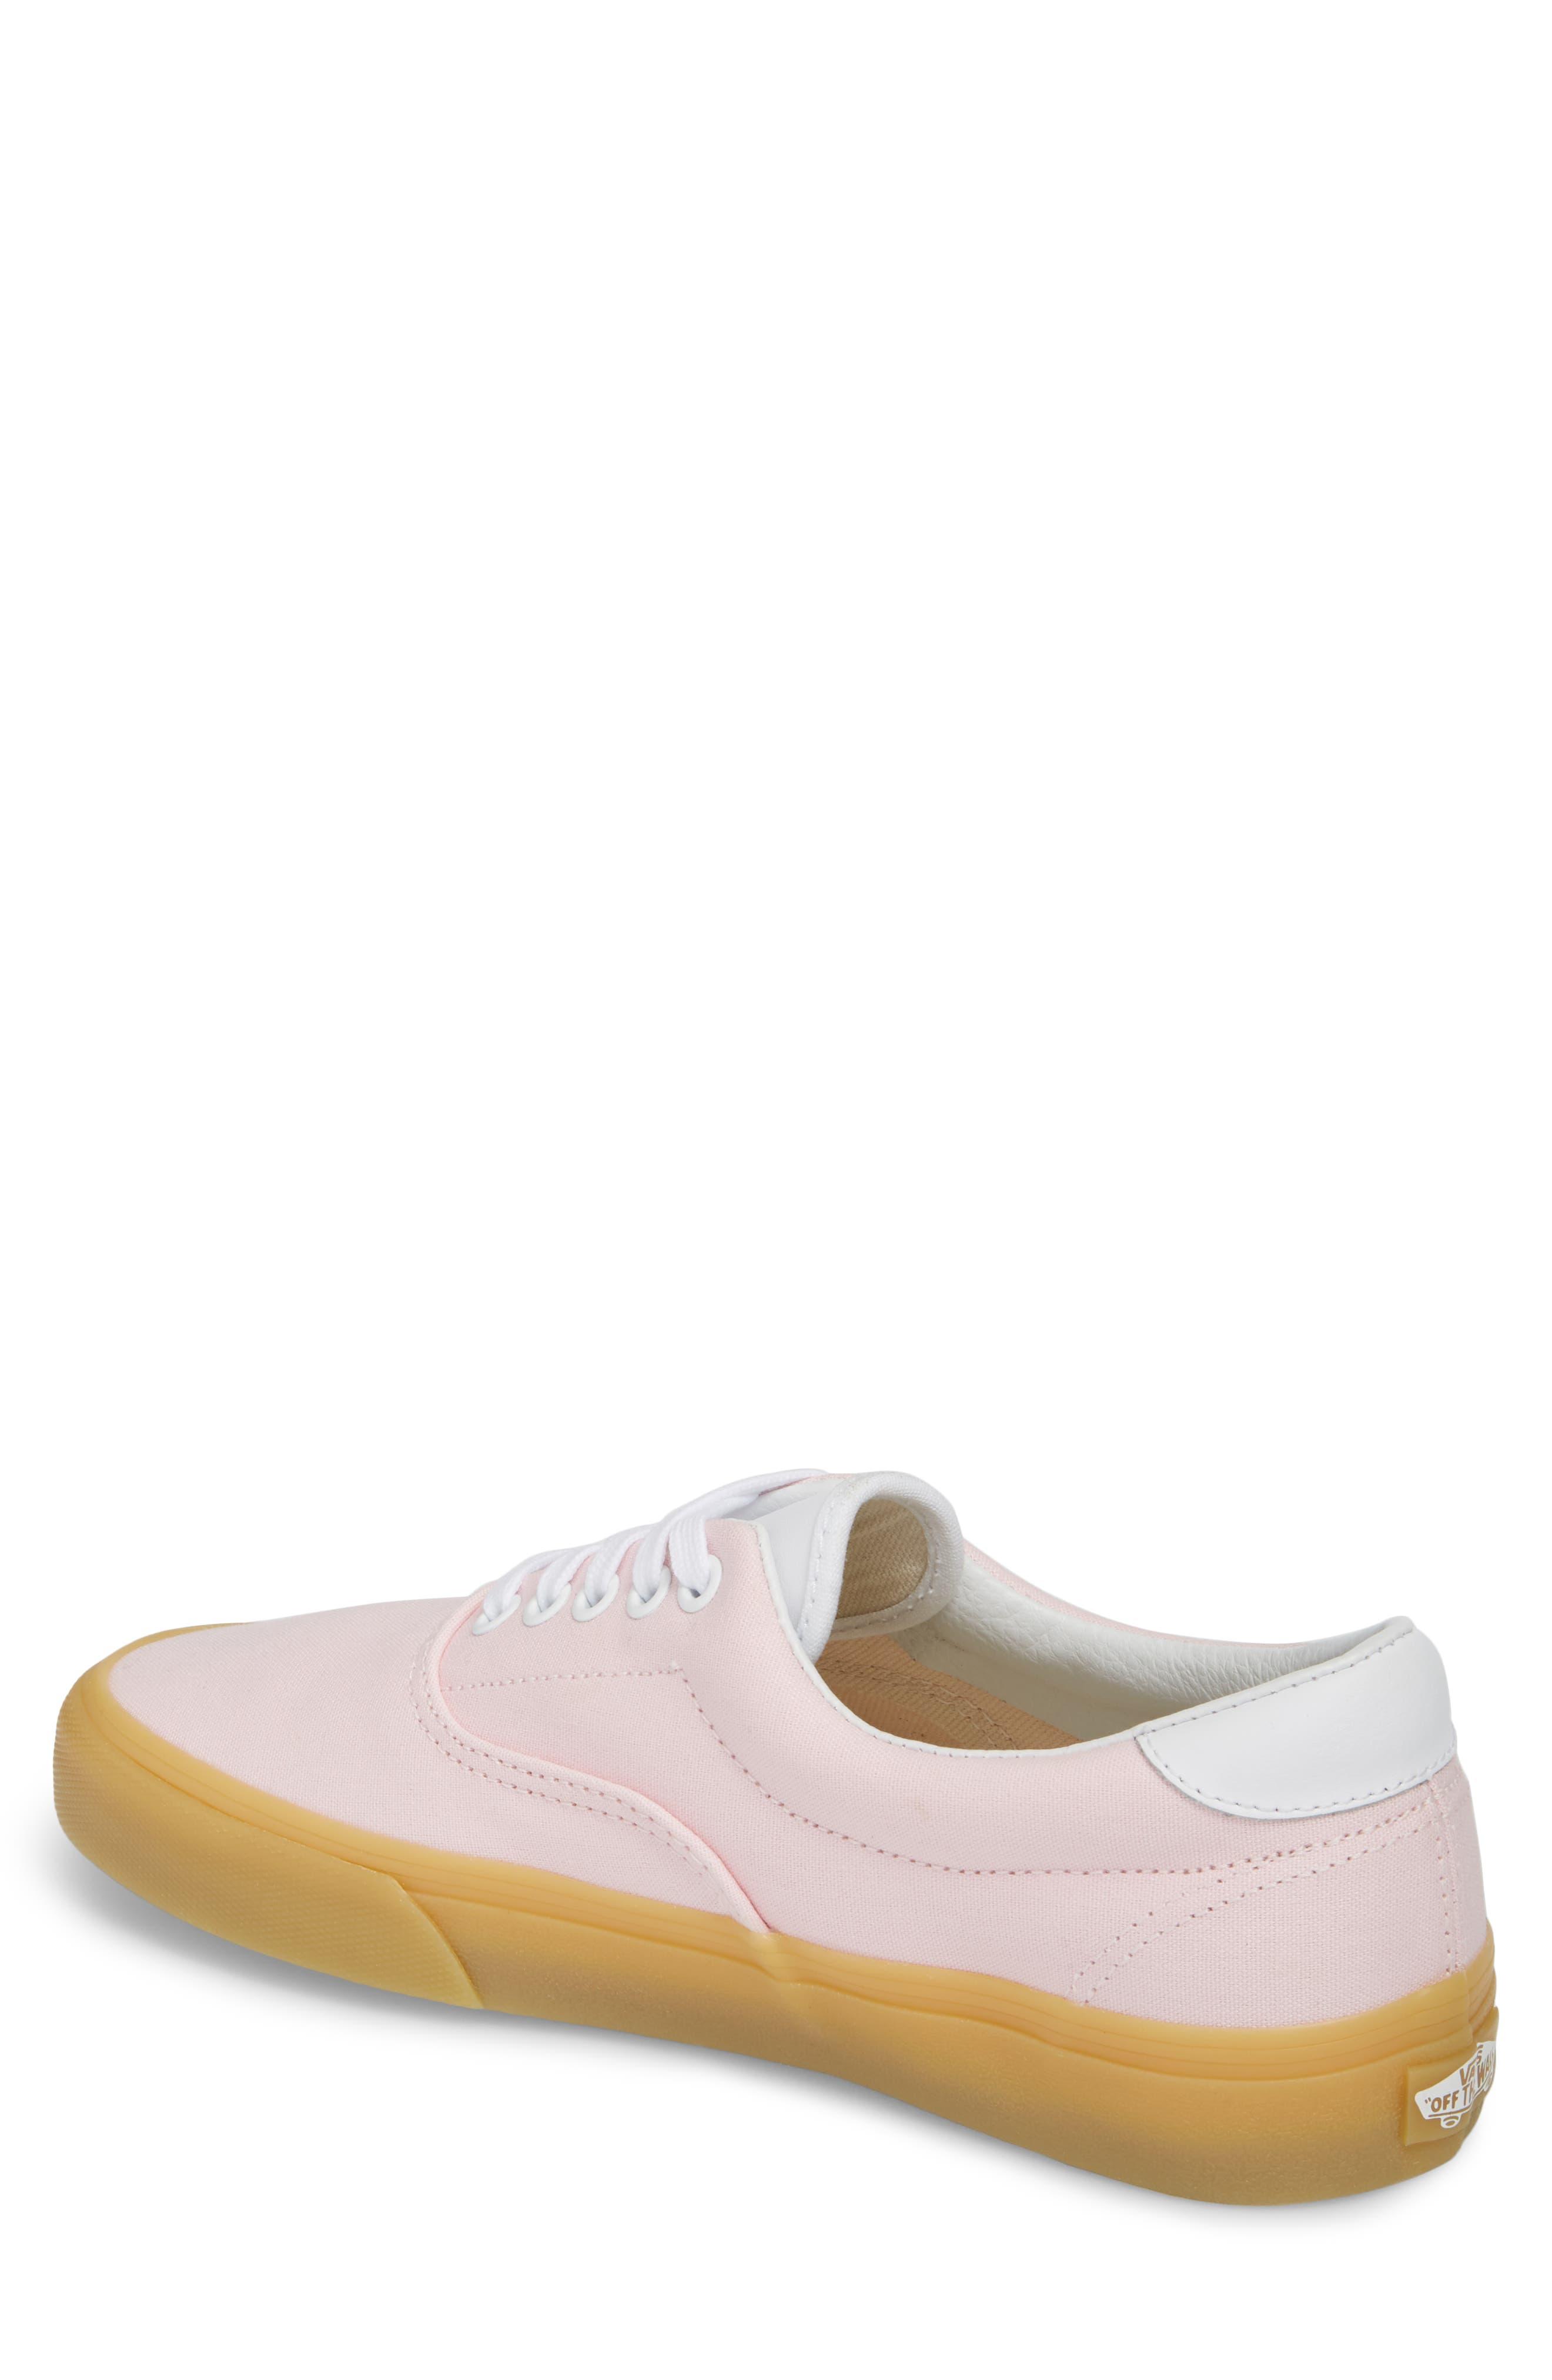 Era 59 Gum Sneaker,                             Alternate thumbnail 2, color,                             Chalk Pink